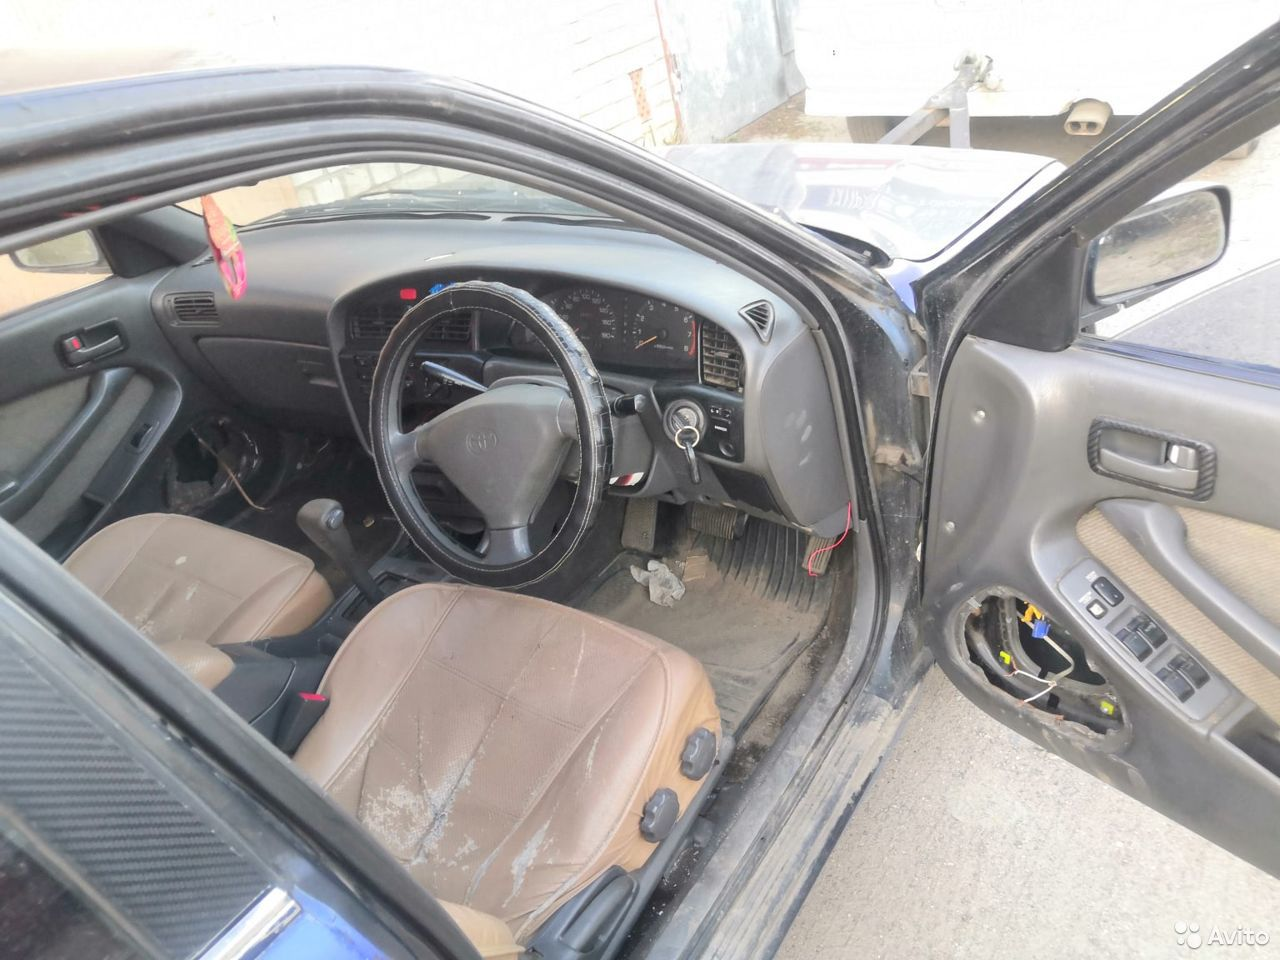 Toyota Camry sv30 в разб